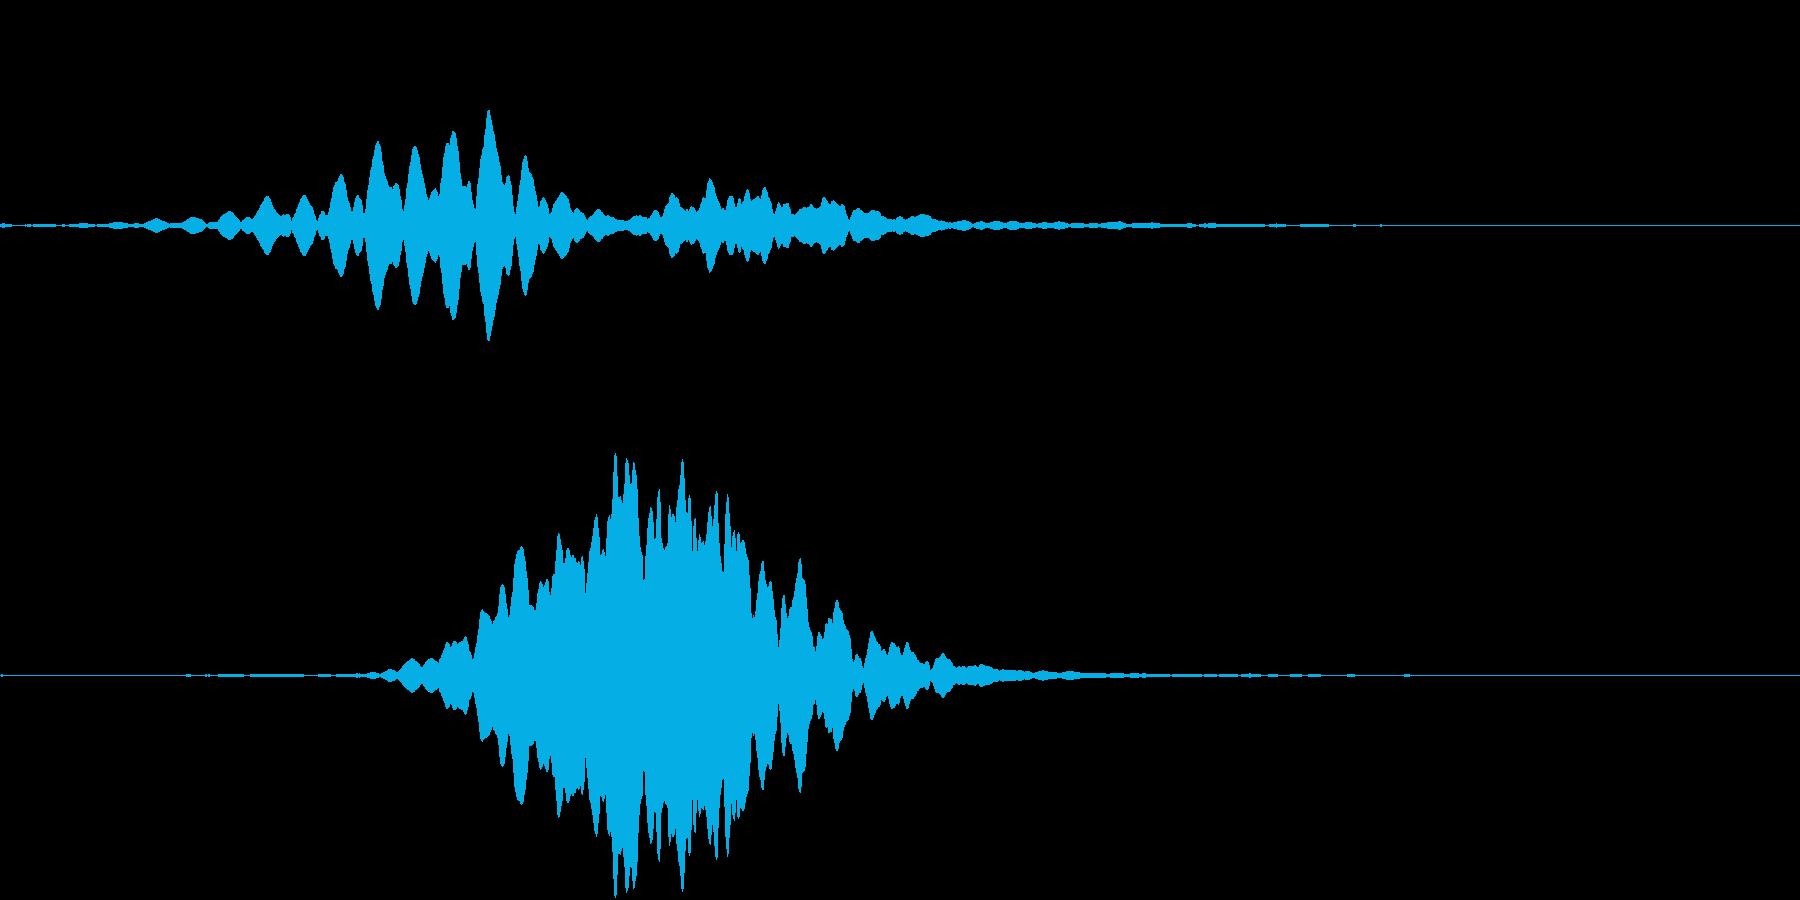 DramaFX 不安を感じるSEの再生済みの波形